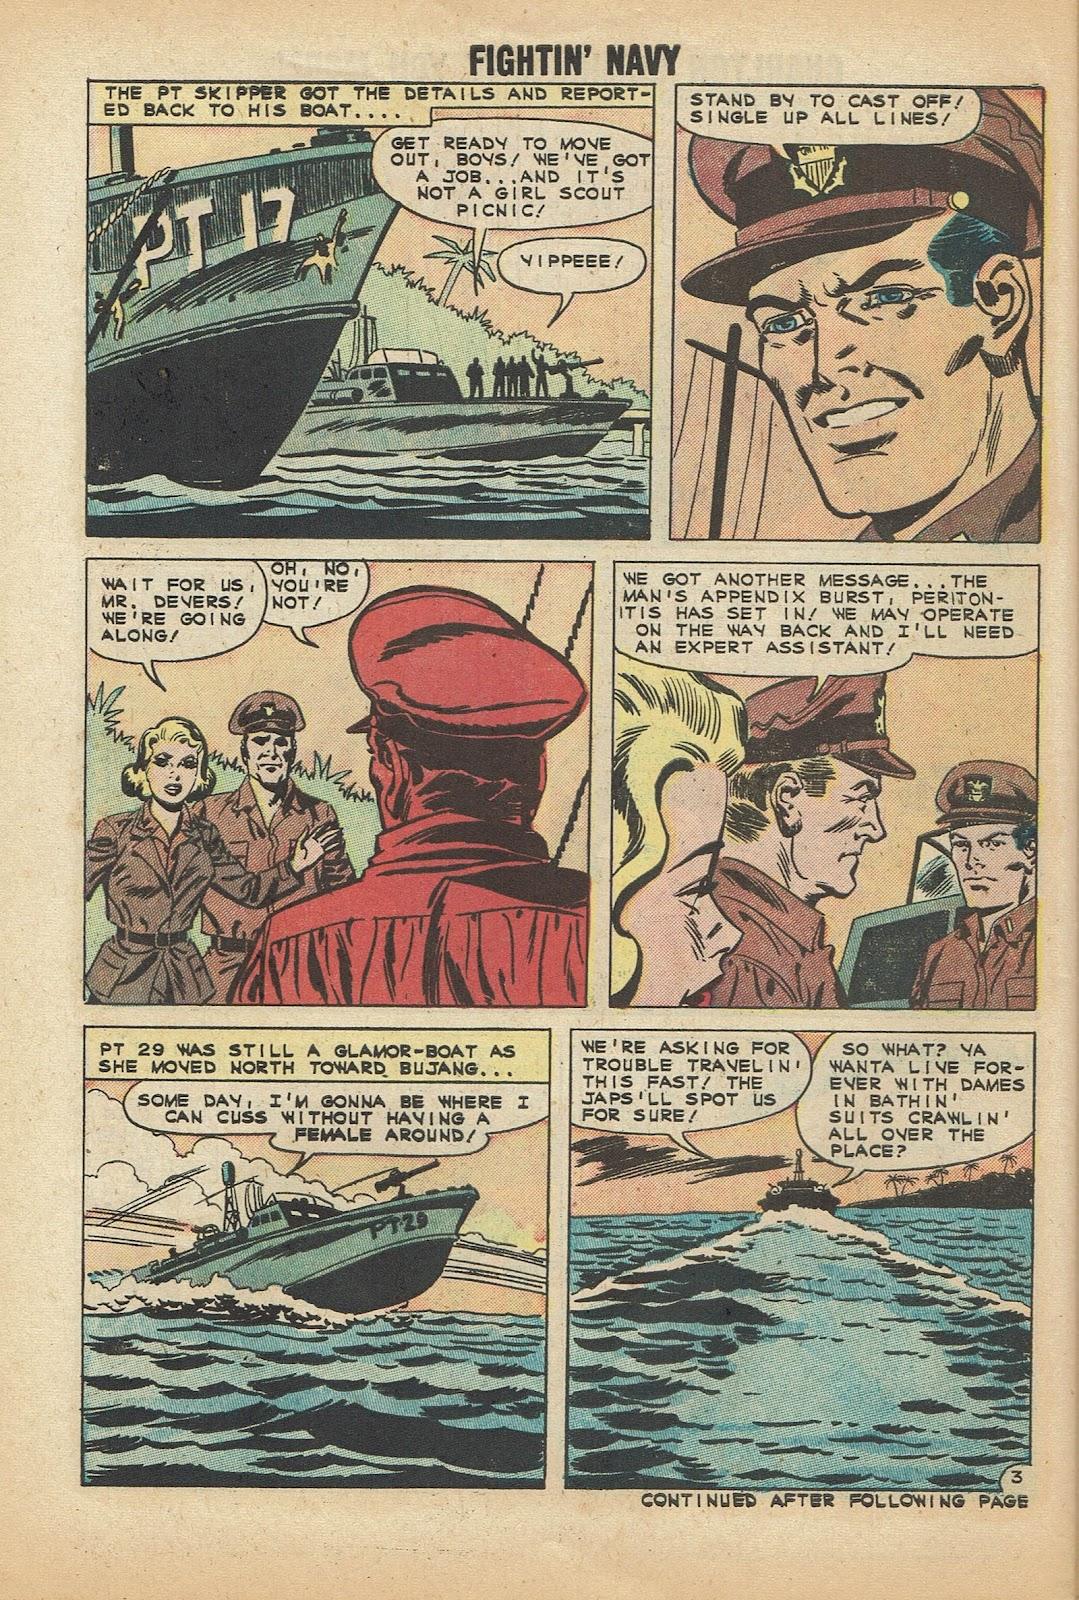 Read online Fightin' Navy comic -  Issue #97 - 30